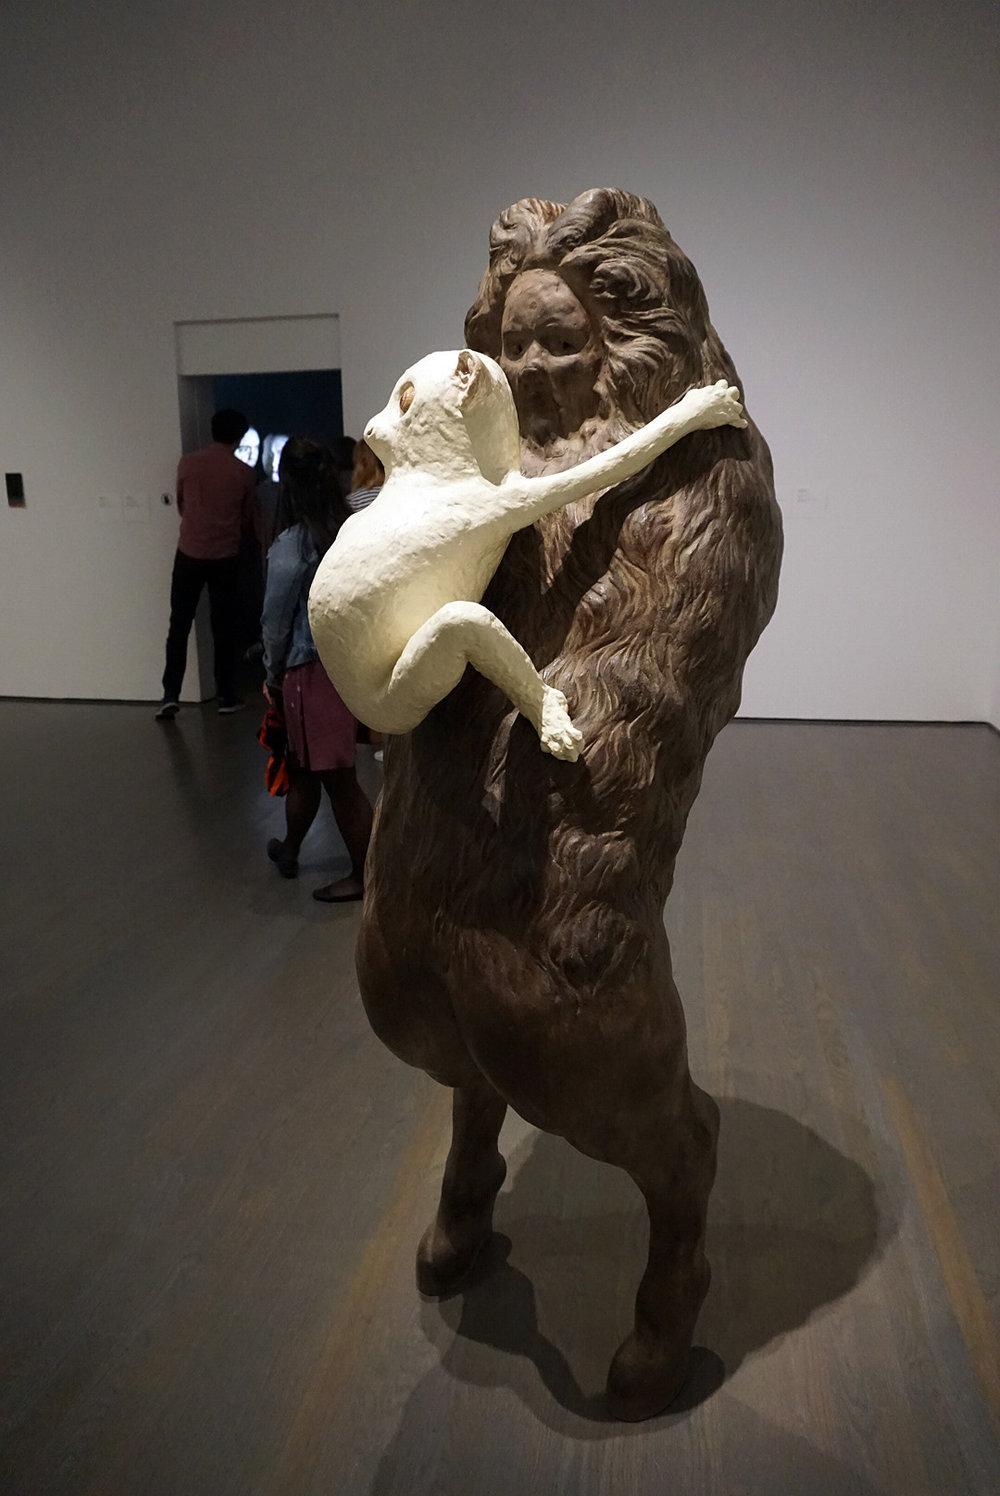 Musée-d'art-contemporain-de-Montréal-Canada-Traveller-Travel-Blogger-LINDATENCHITRAN-12-1616x1080.jpg